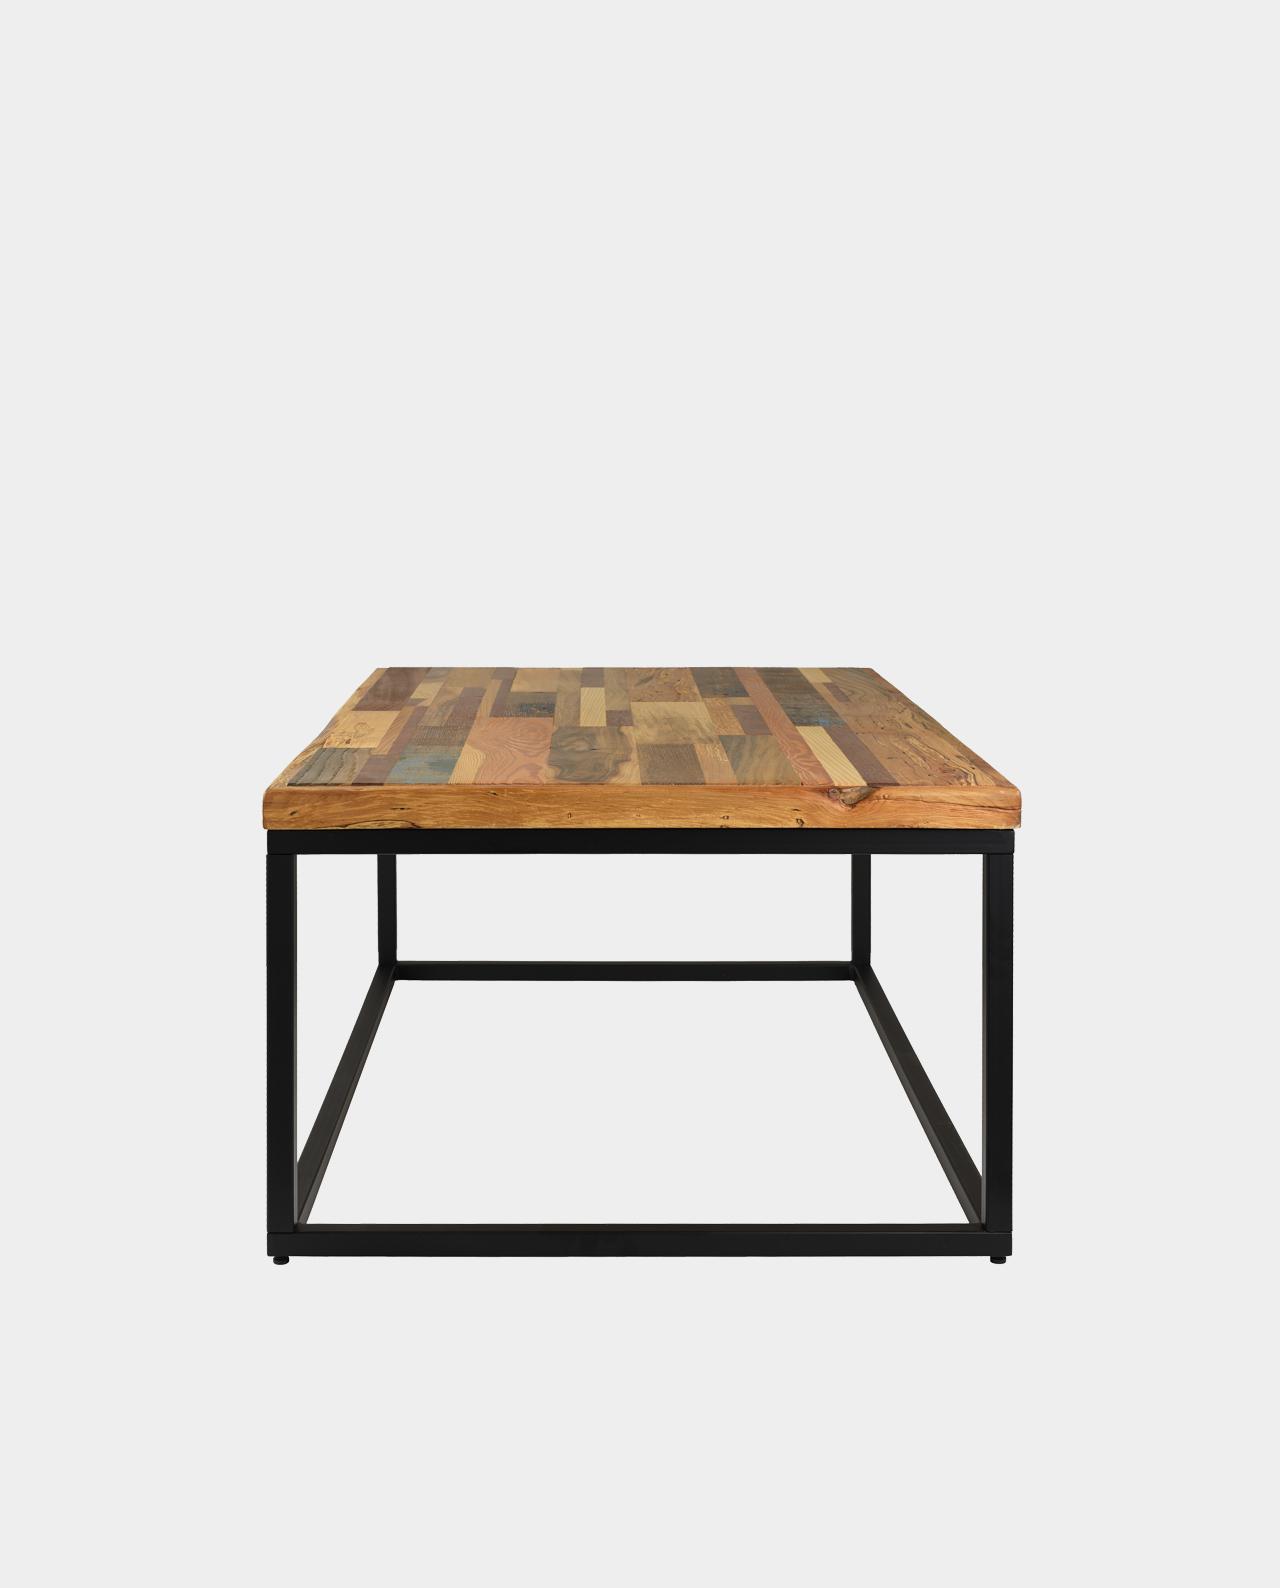 Design Couchtisch STURE » Jetzt online kaufen | Satamo.de